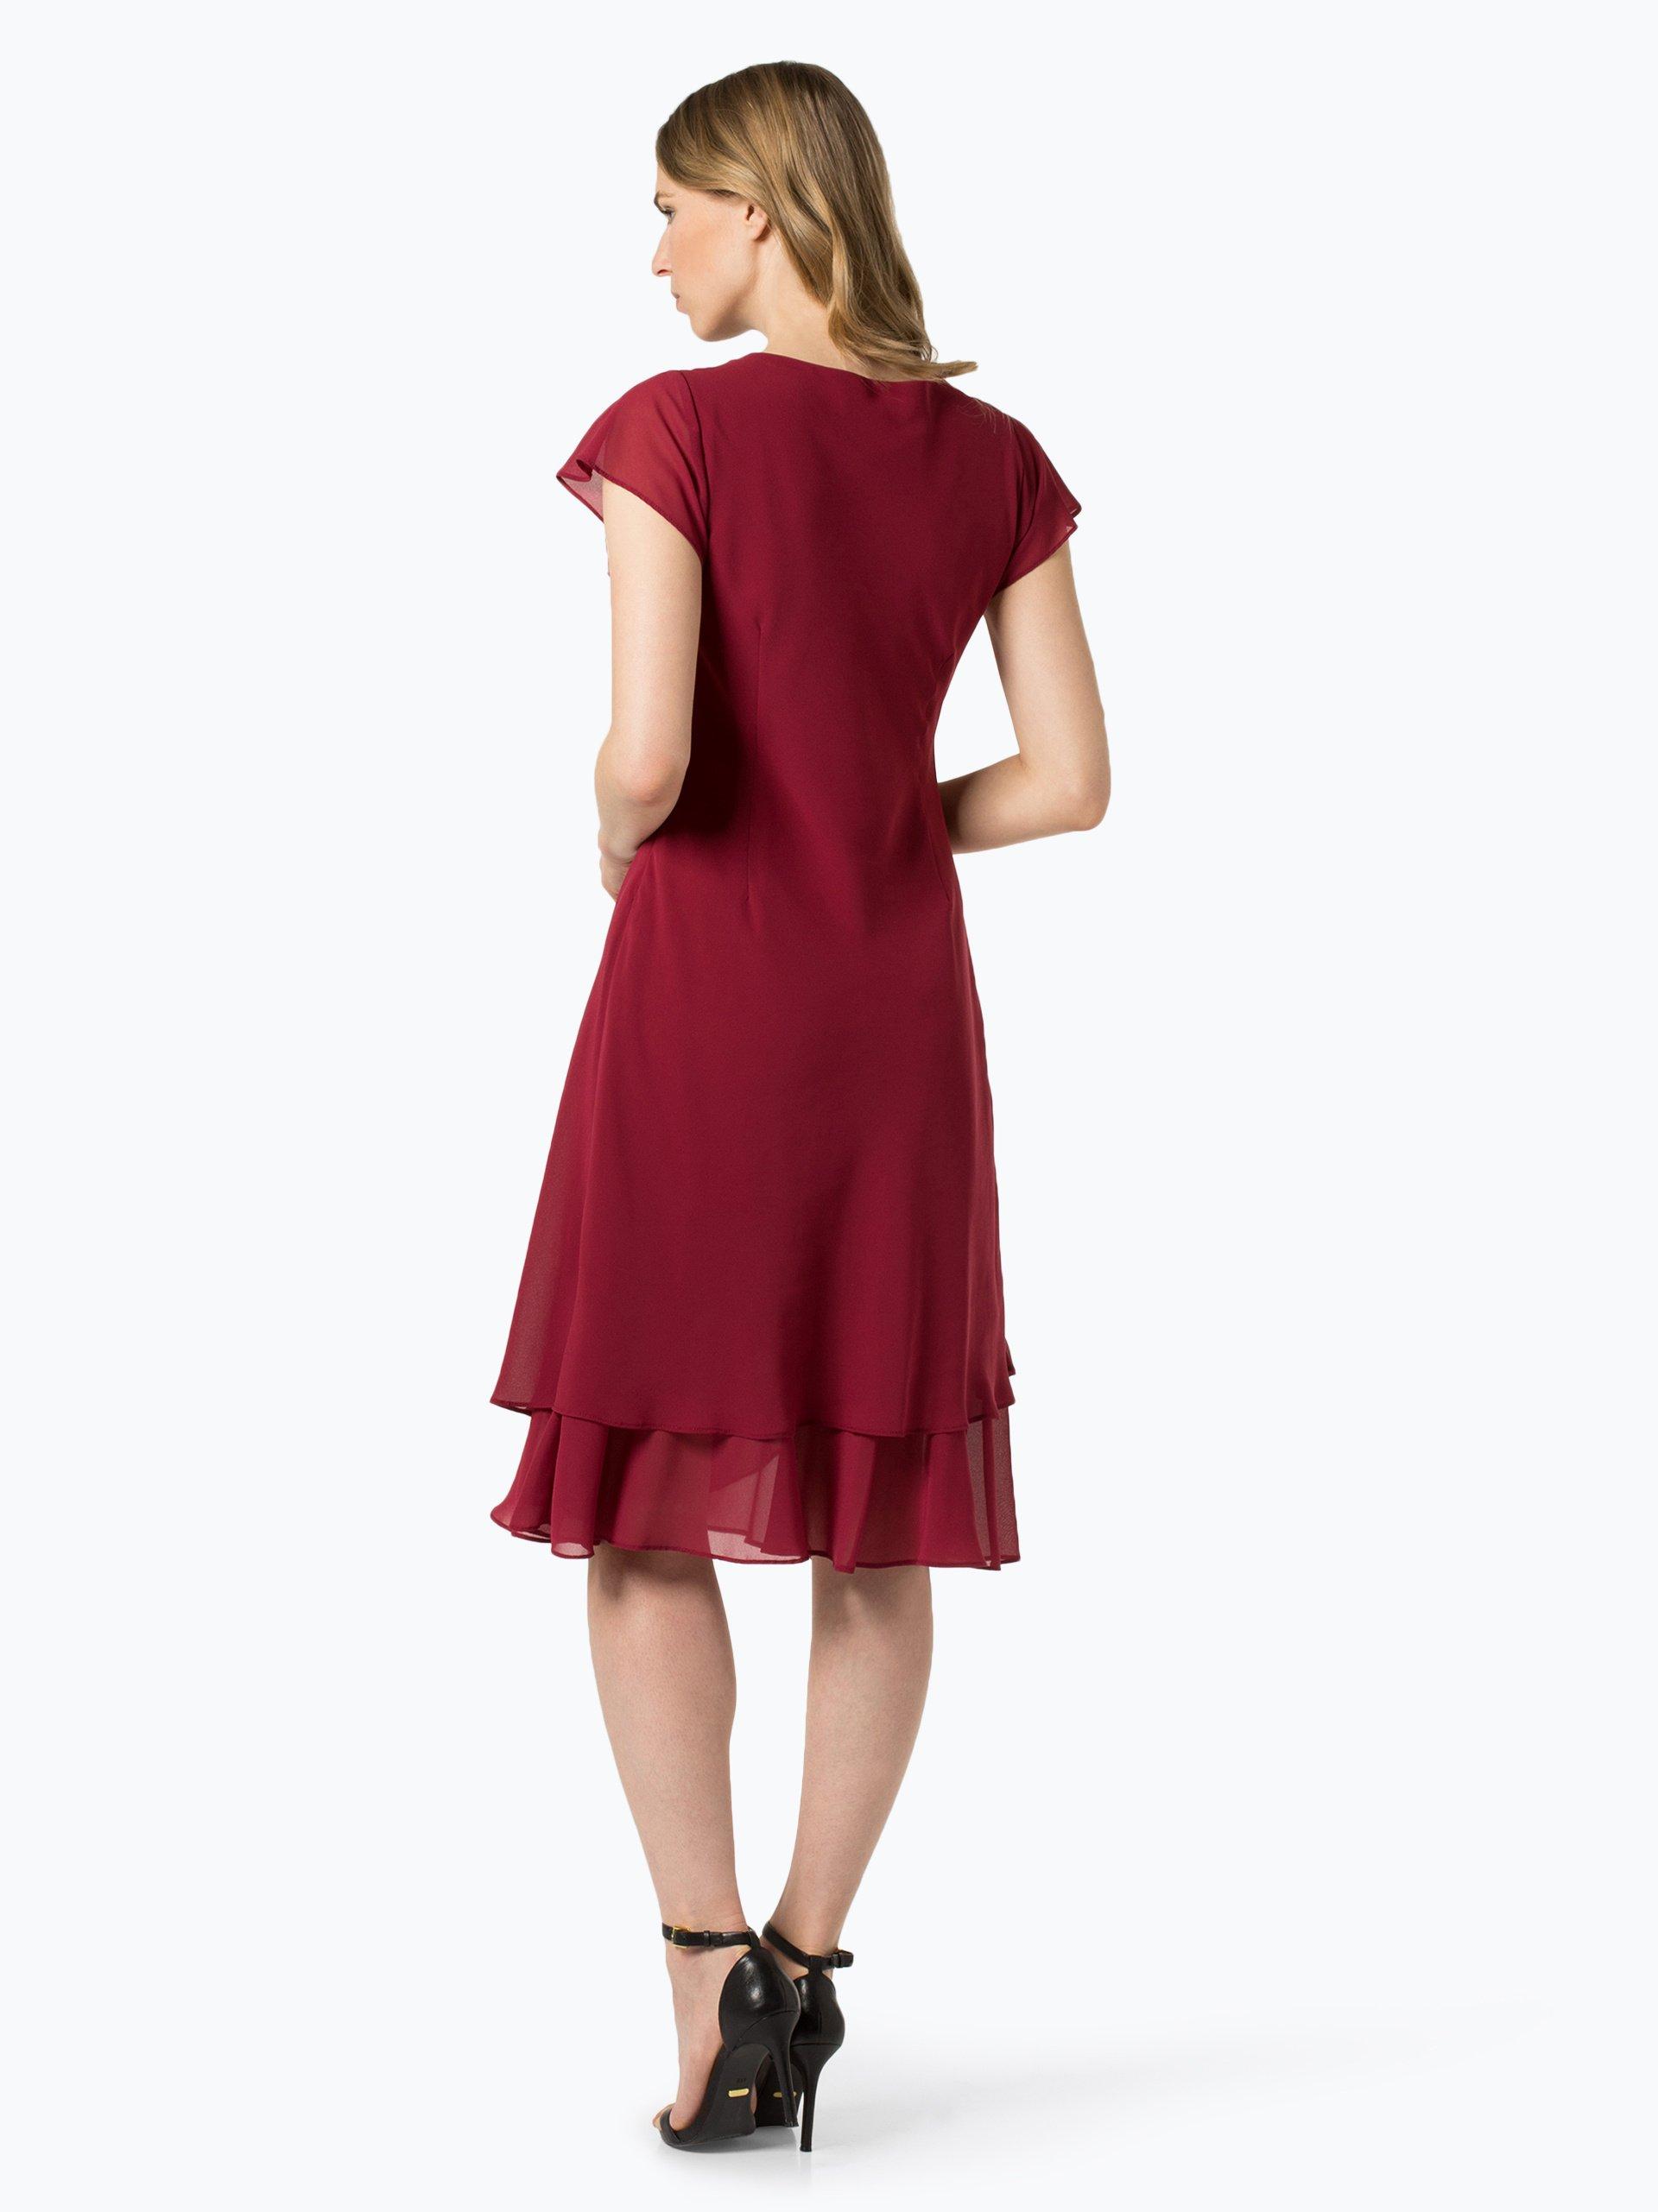 Ambiance Damska sukienka wieczorowa